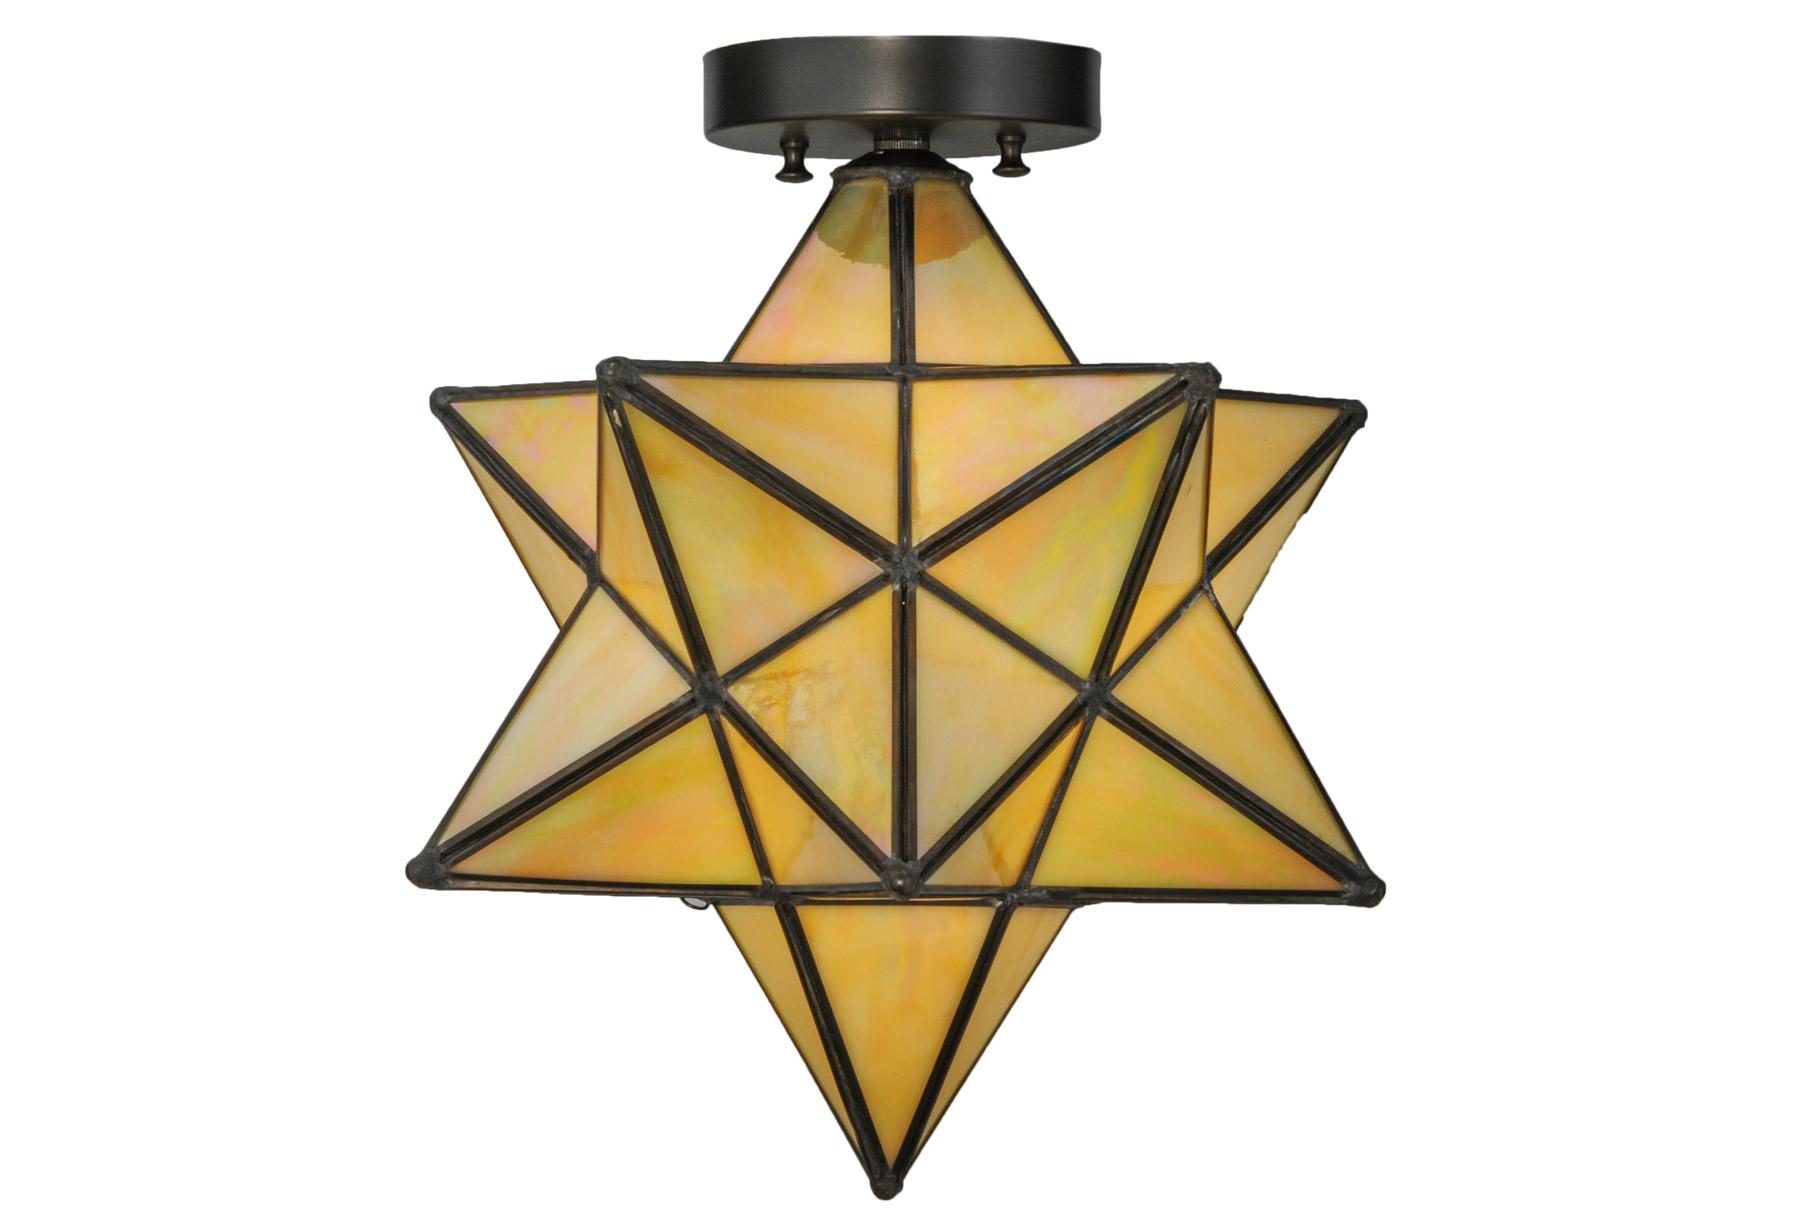 light pendant meyda wonderfull luxury lighting lt moravian cascading w world star of unique